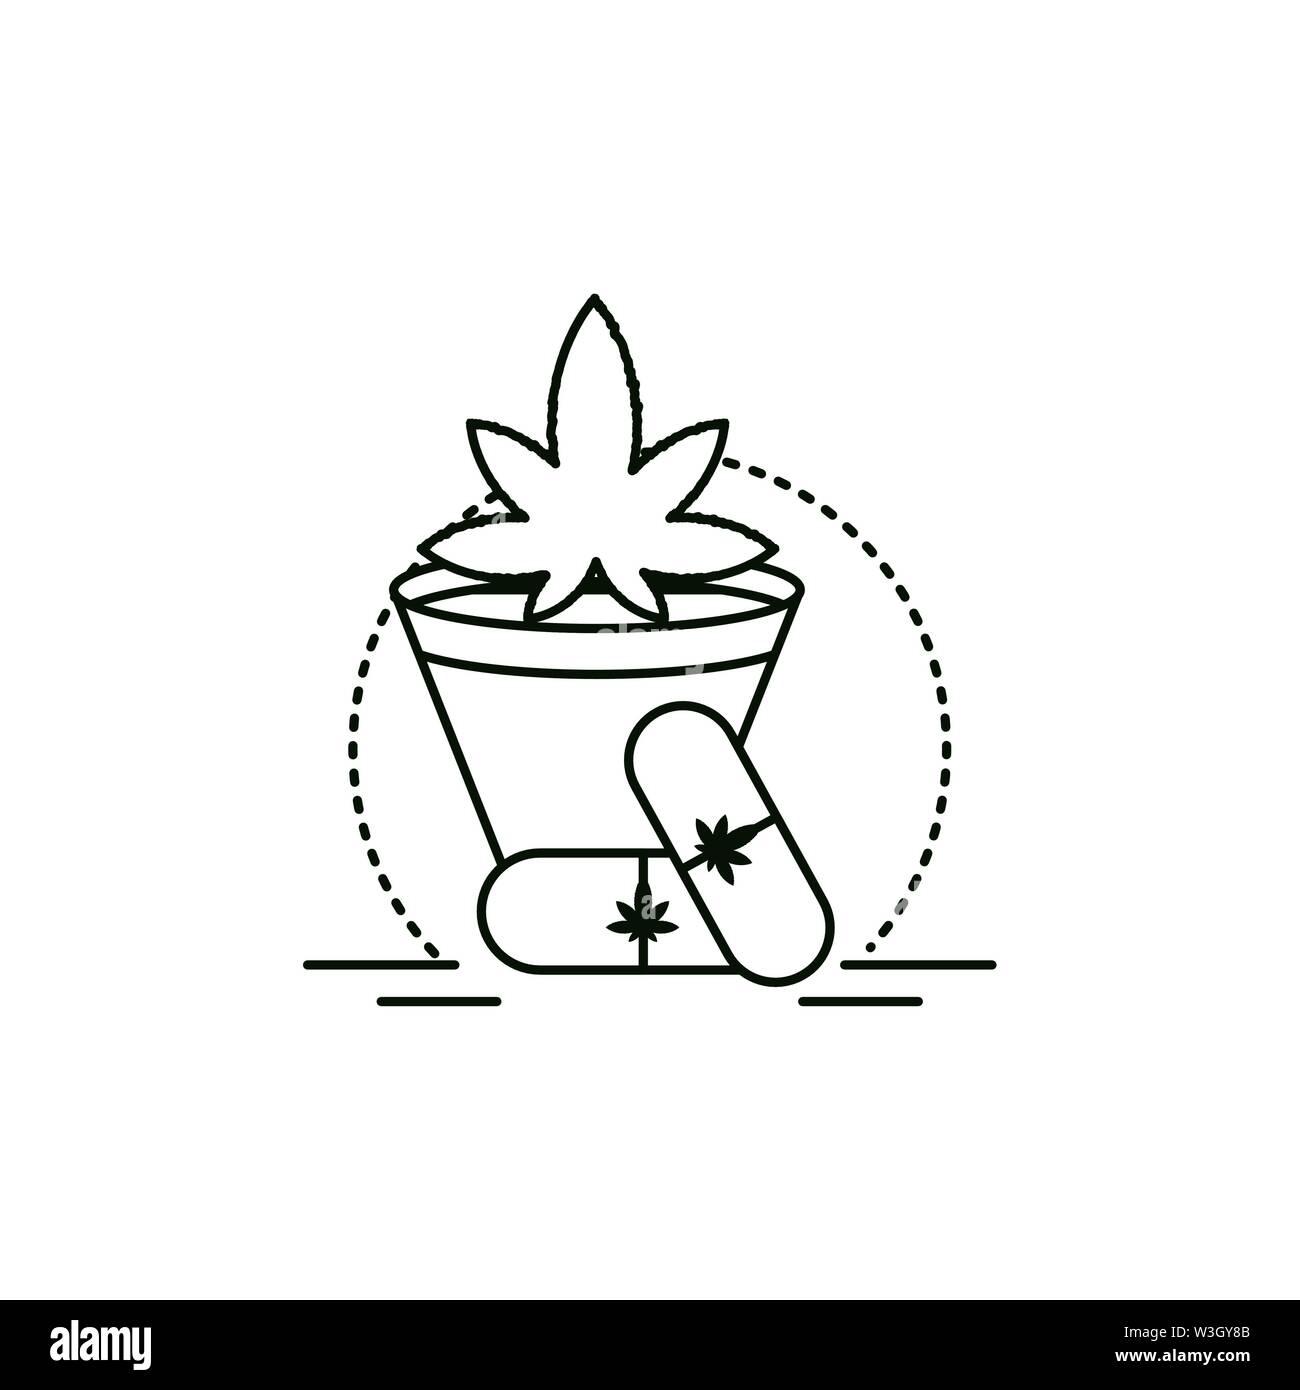 Cannabis Droge Kapsel mit zimmerpflanze Vector Illustration Design Stockbild